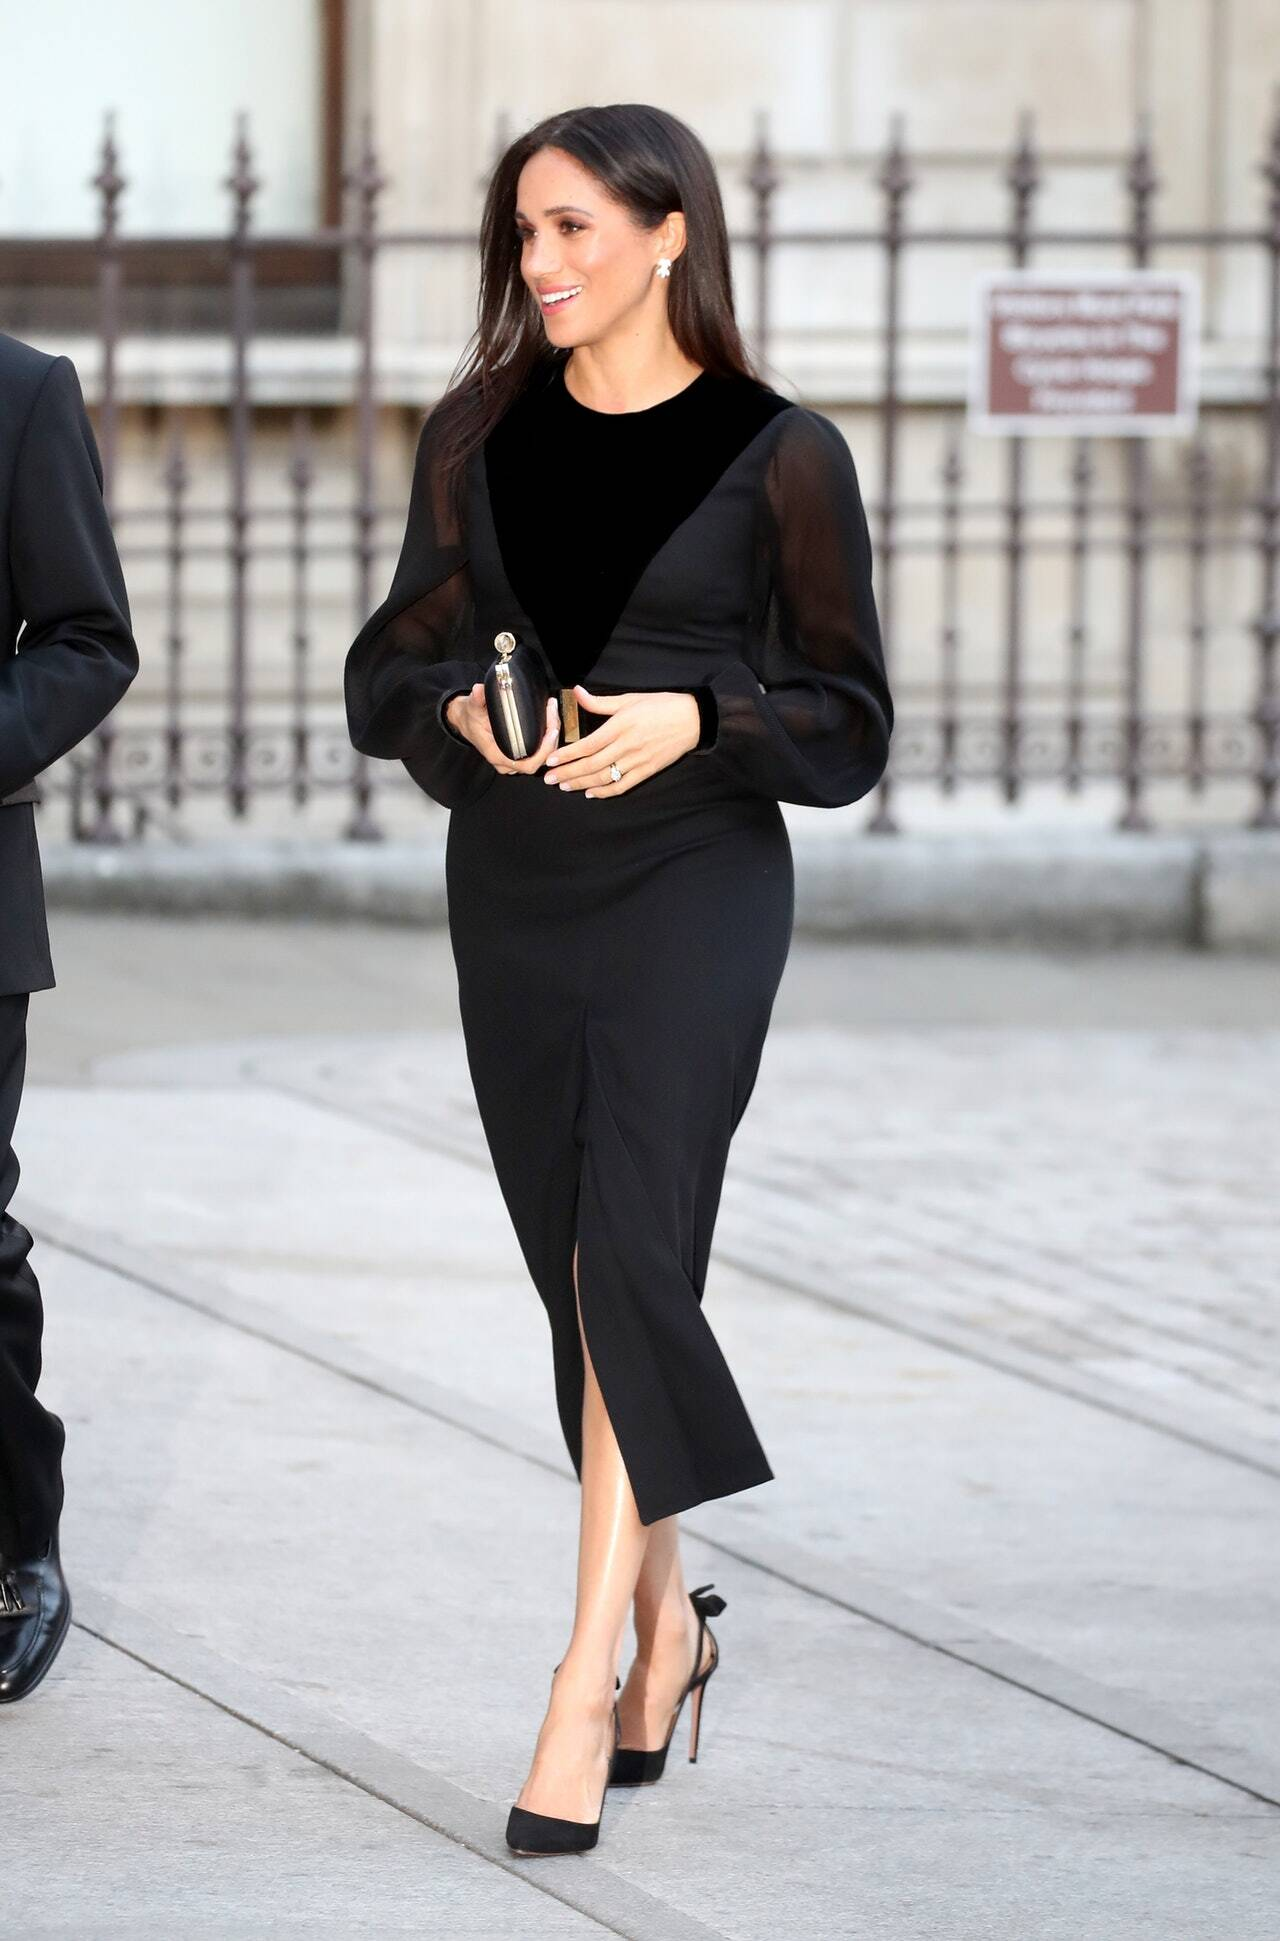 Complete Black Statement Dress